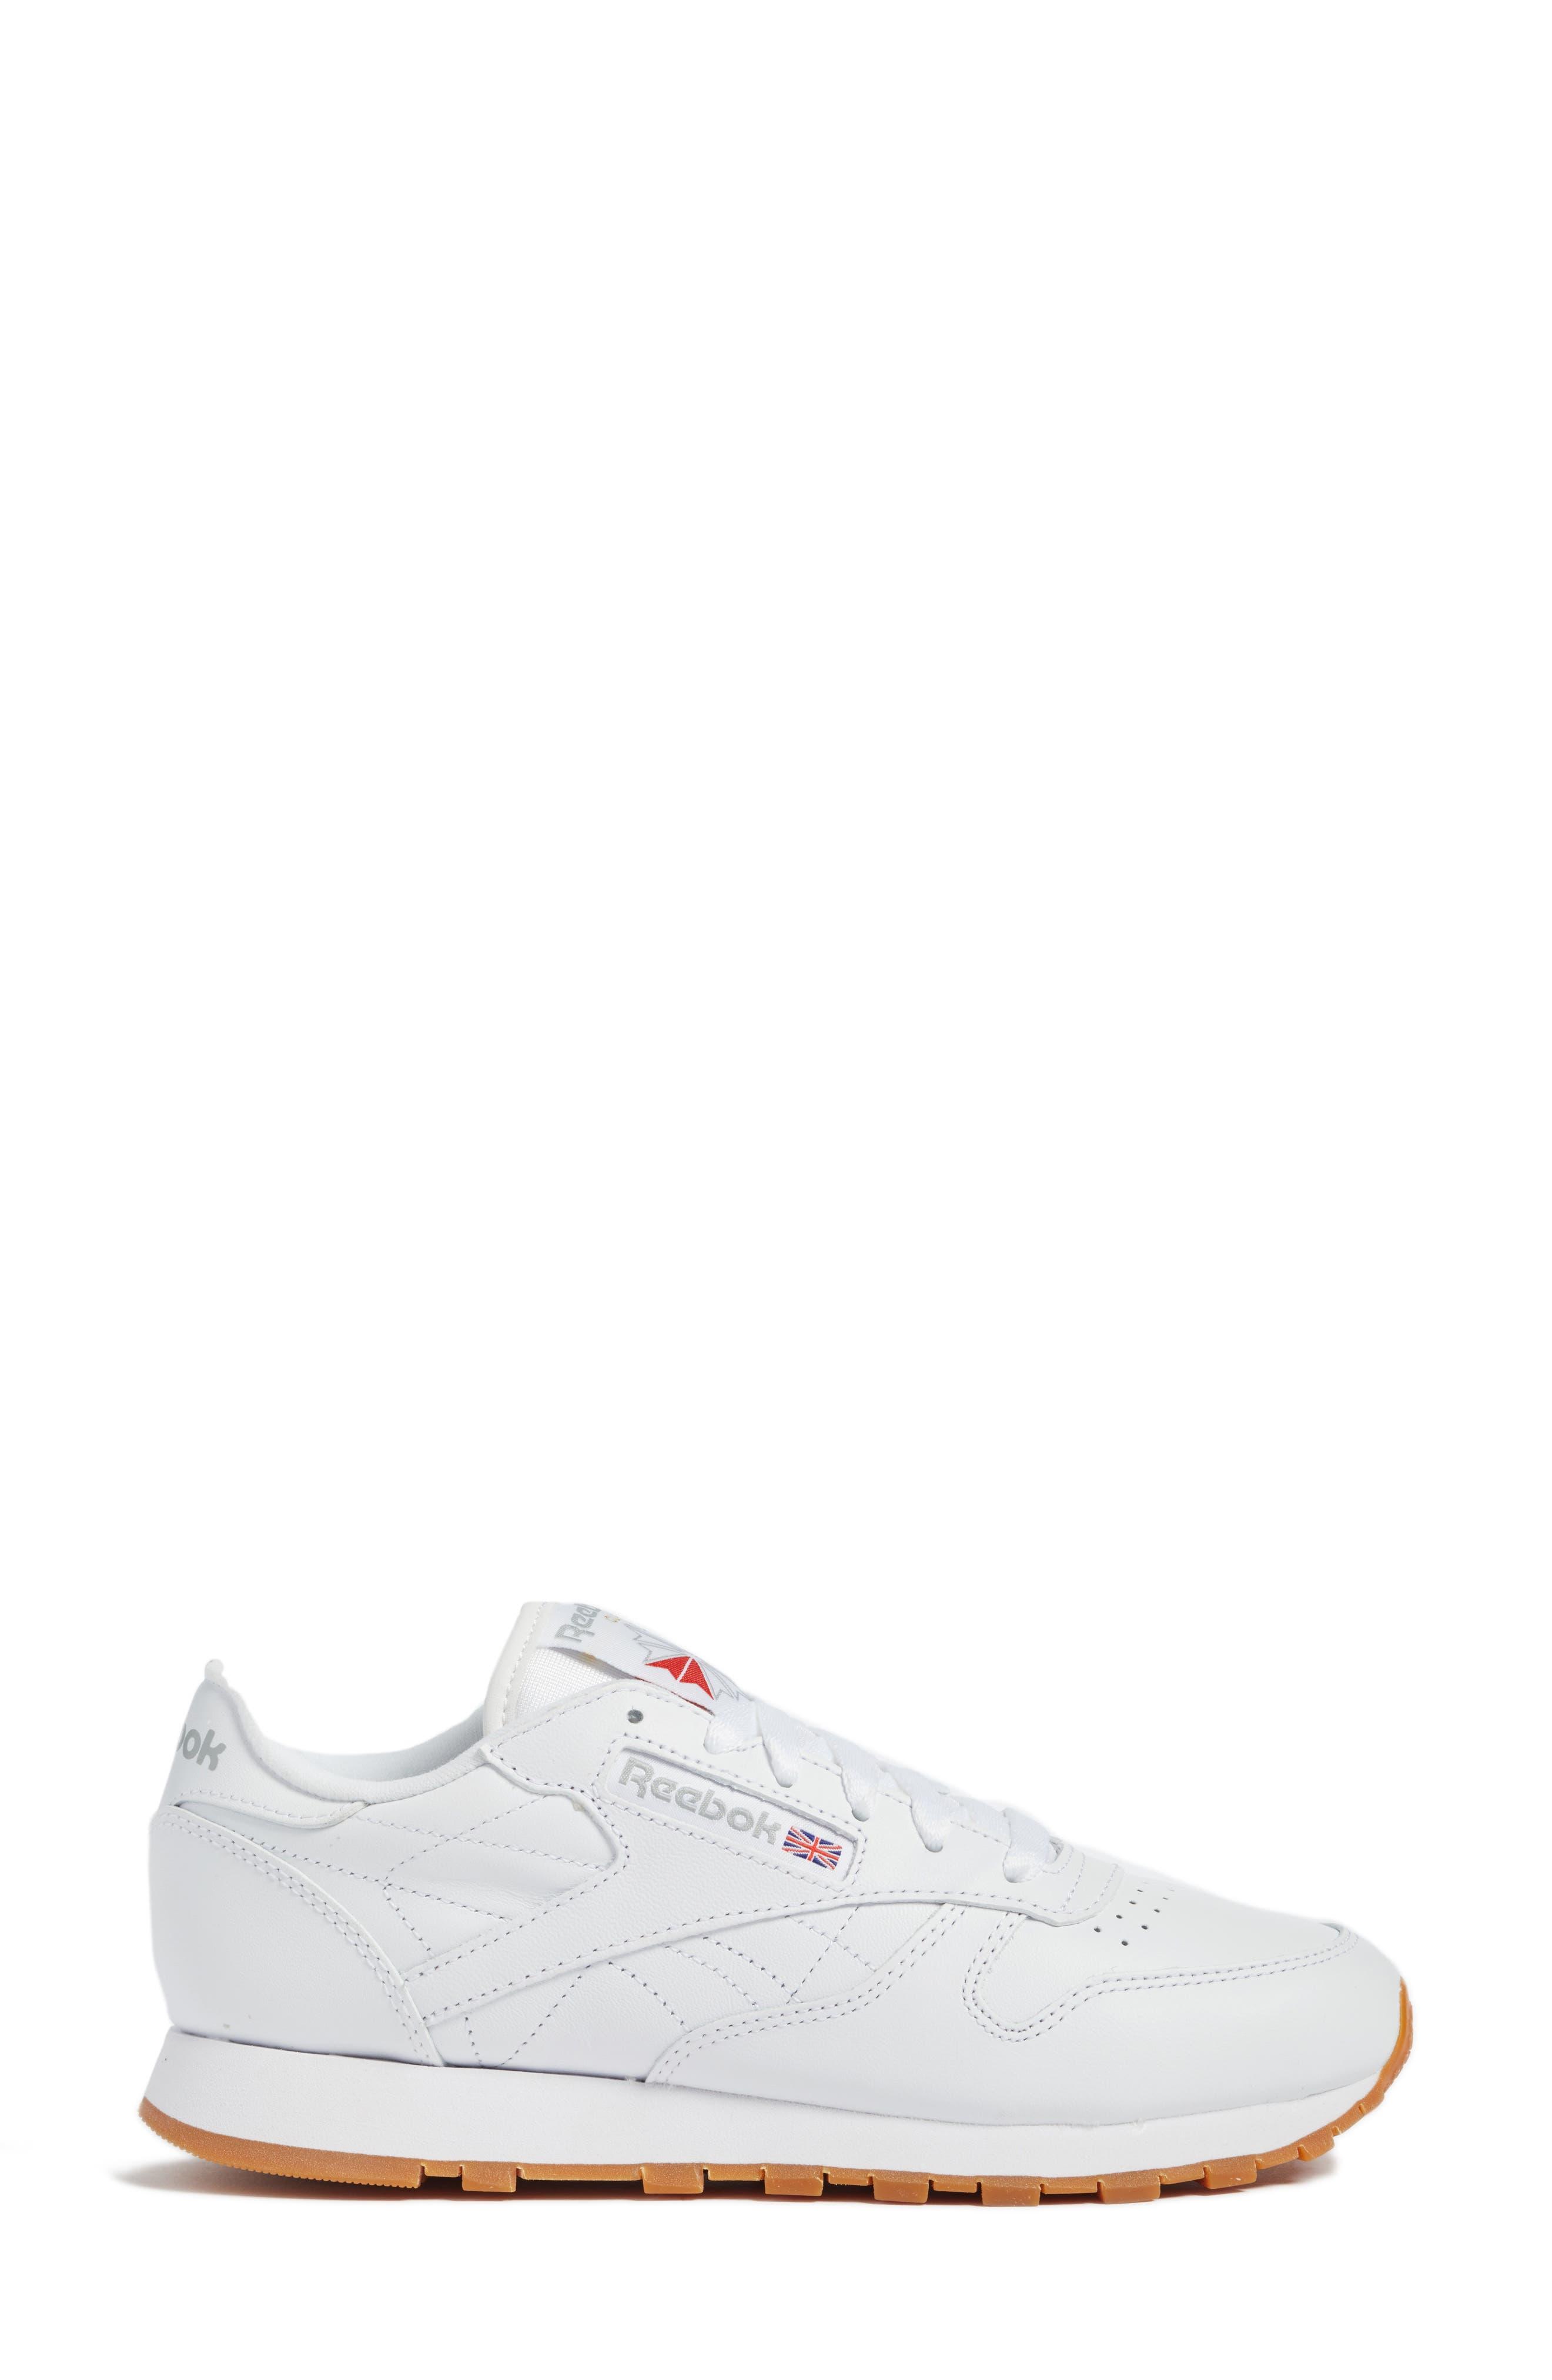 REEBOK, Classic Leather Sneaker, Alternate thumbnail 3, color, US-WHITE/ GUM